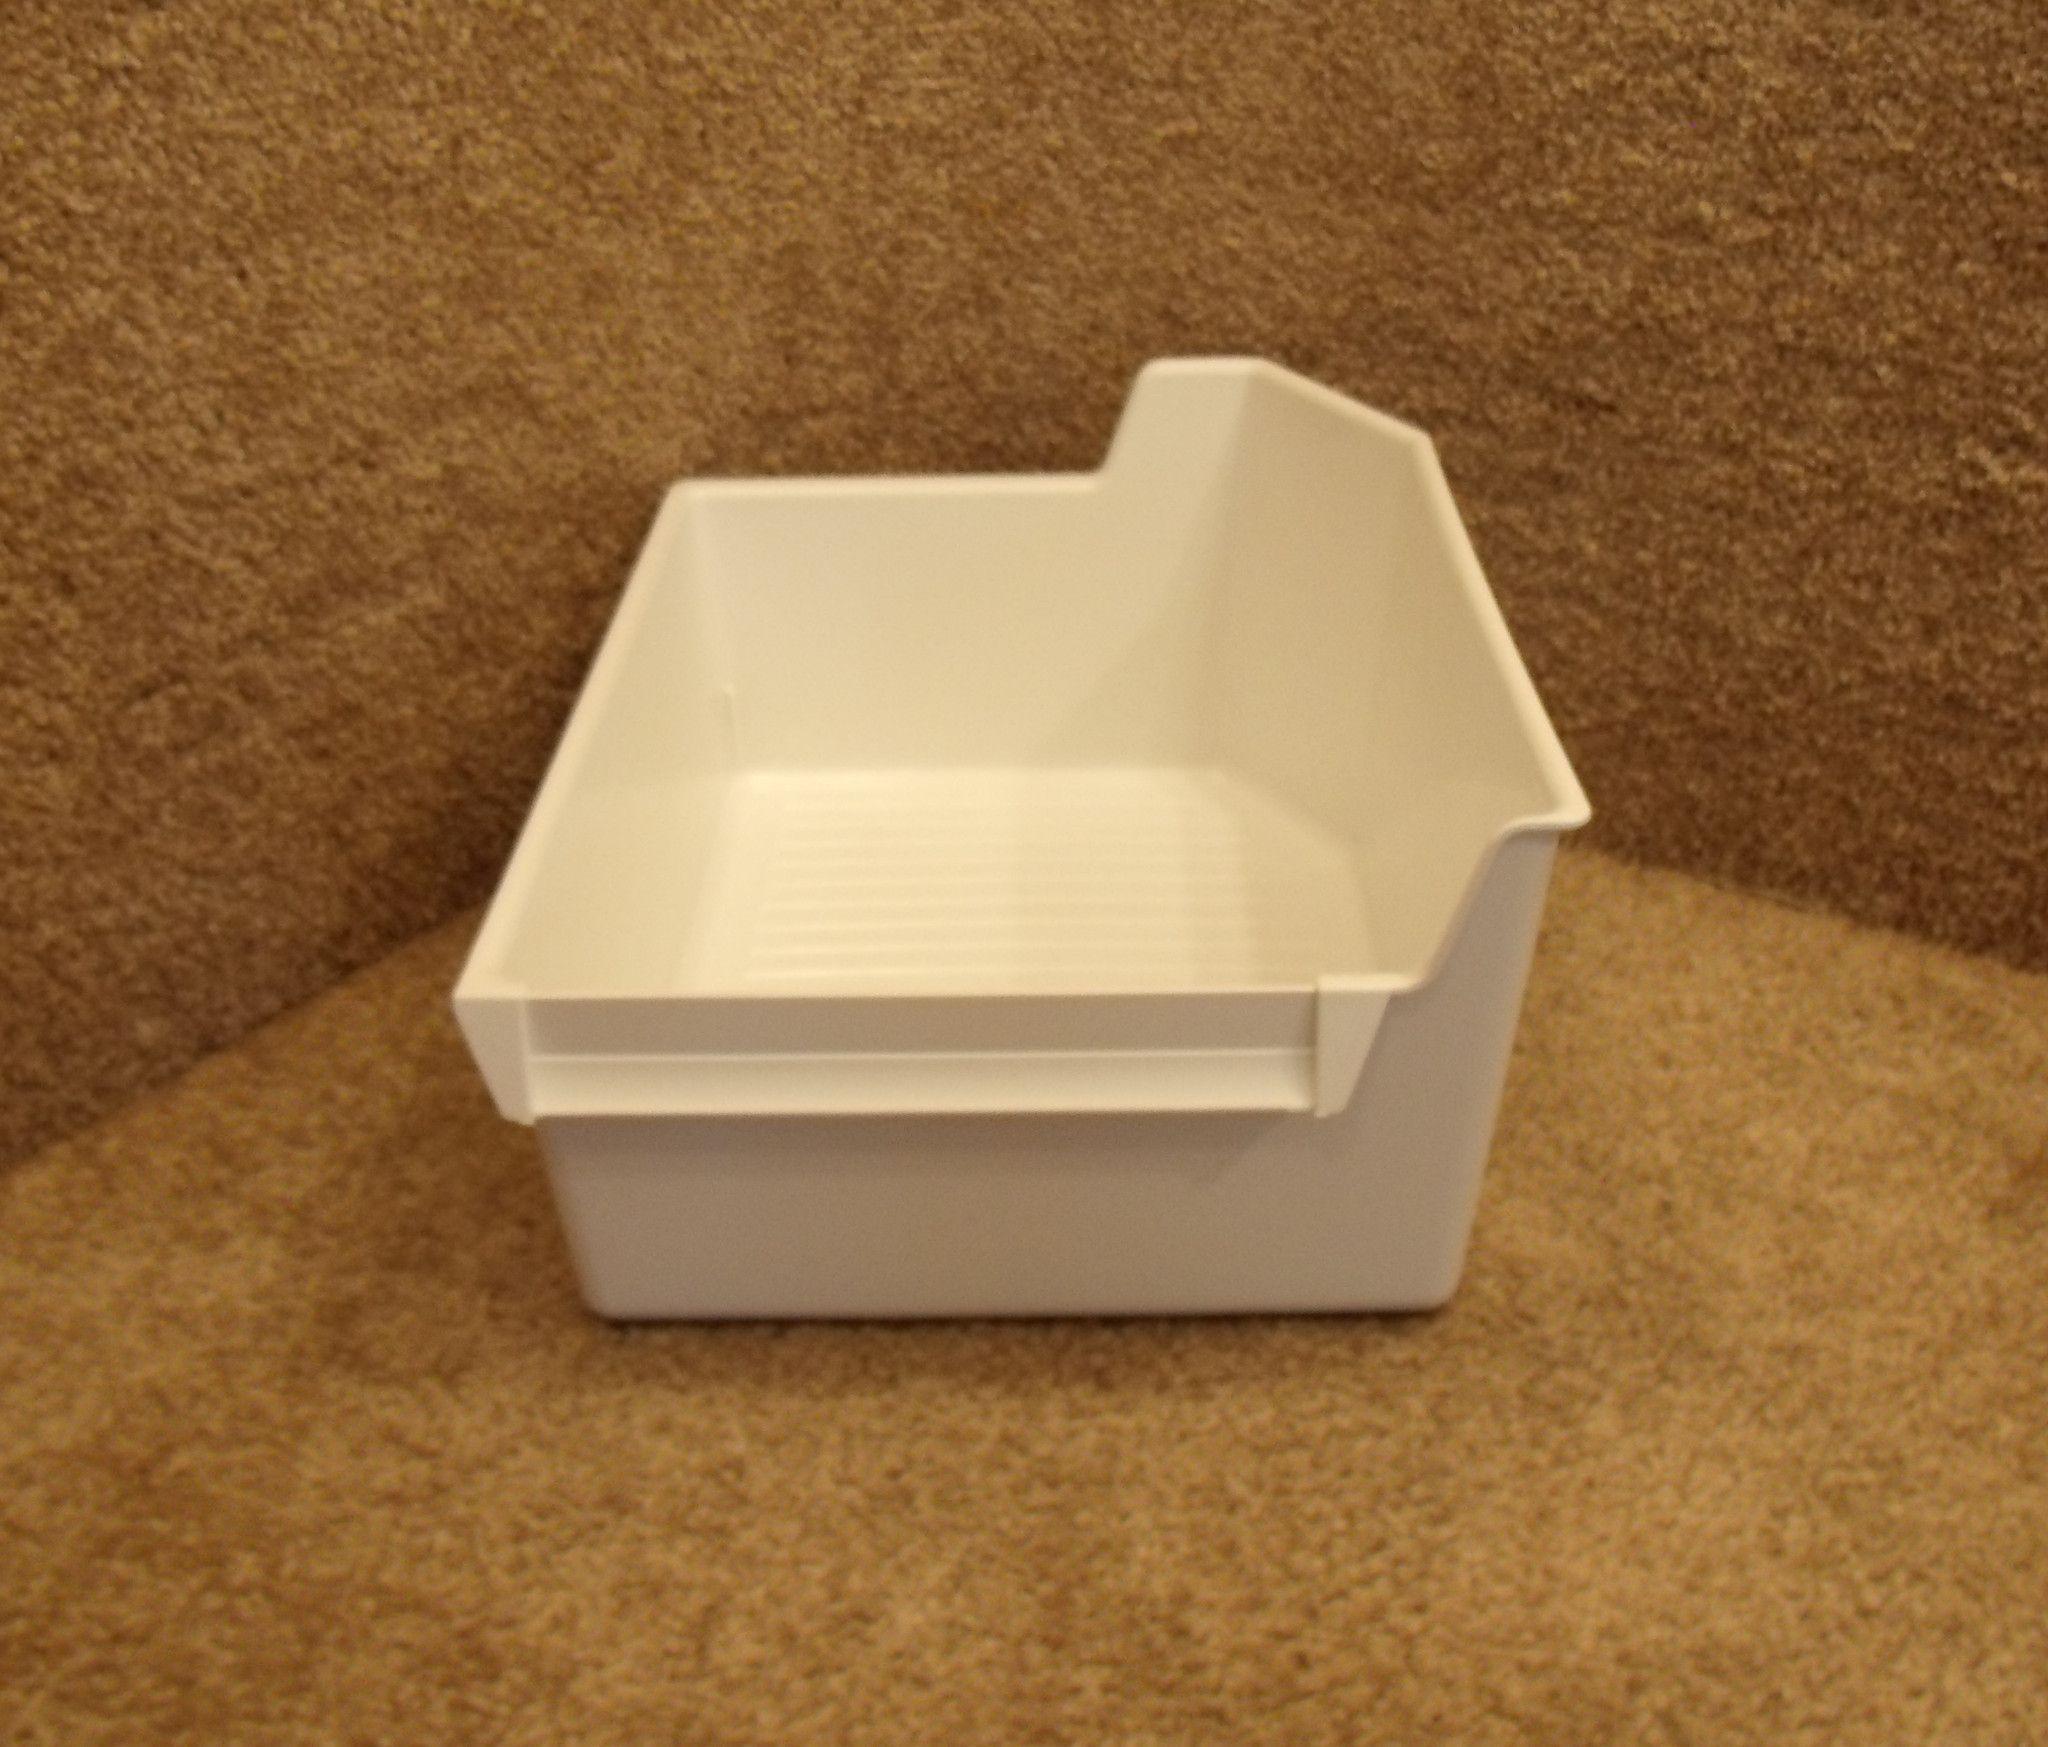 Whirlpool white ice products - 2166261 Whirlpool Refrigerator White Ice Bin